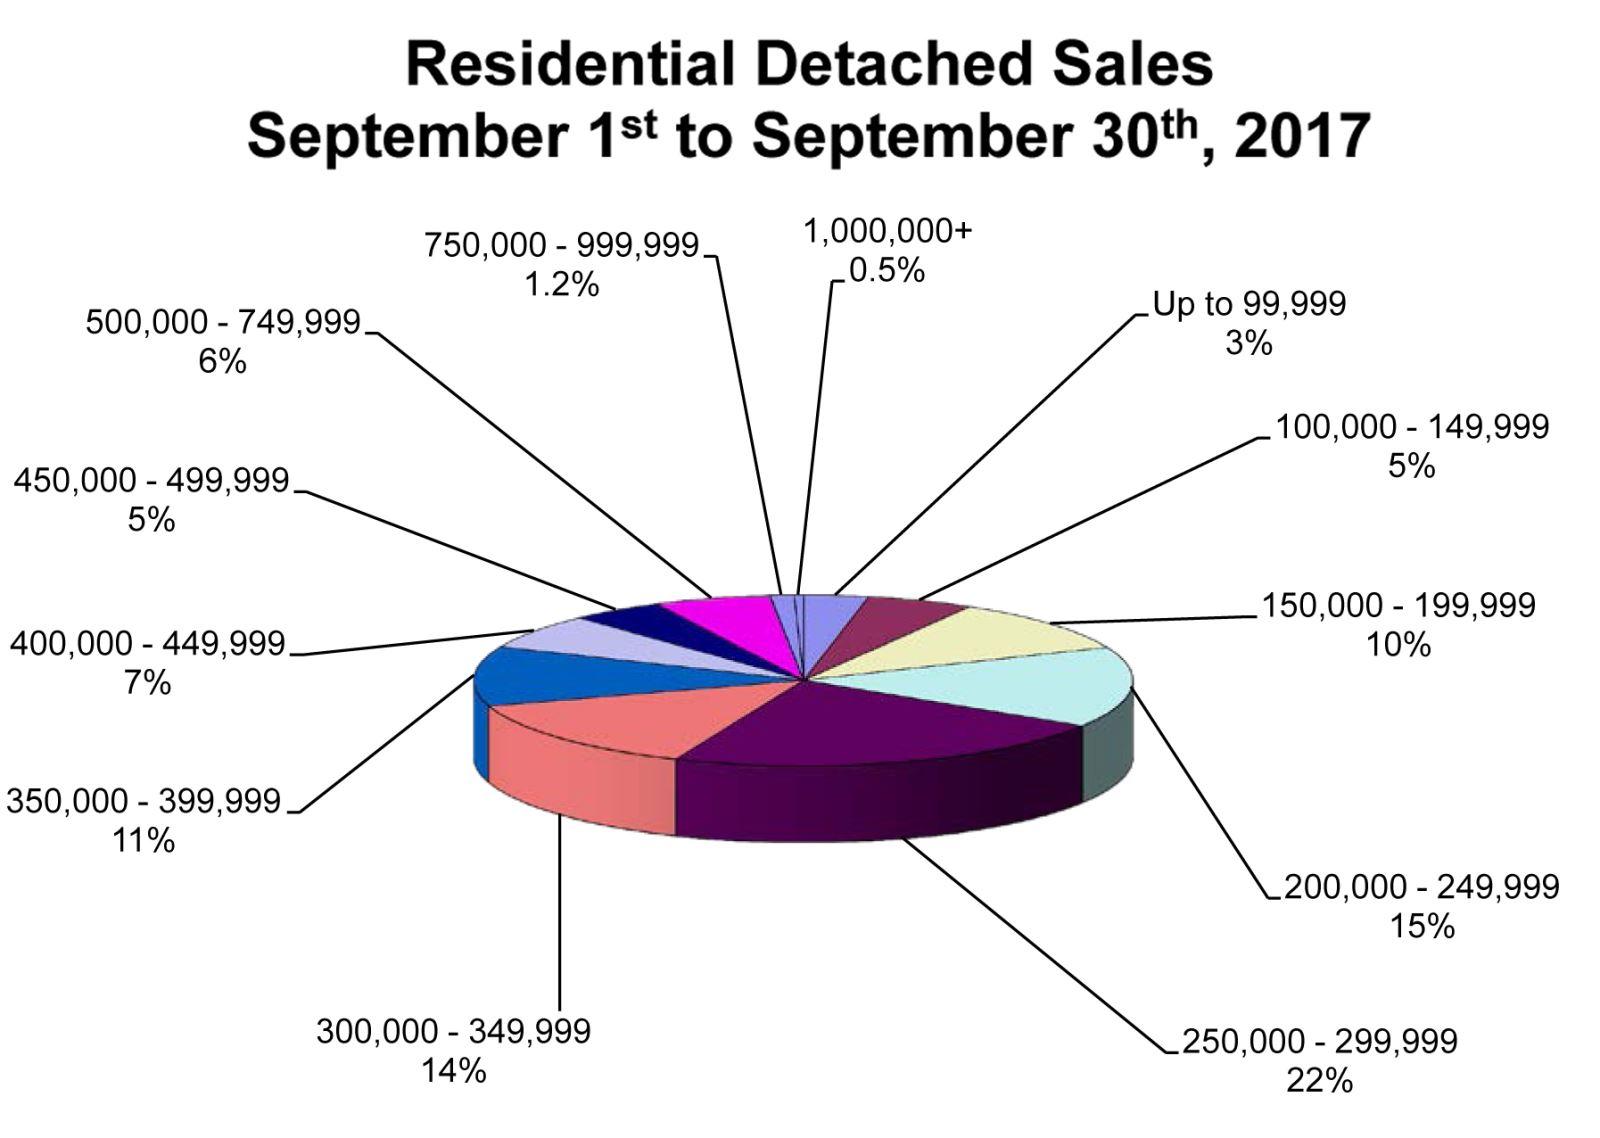 RD Sales Pie Chart September 2017.jpg